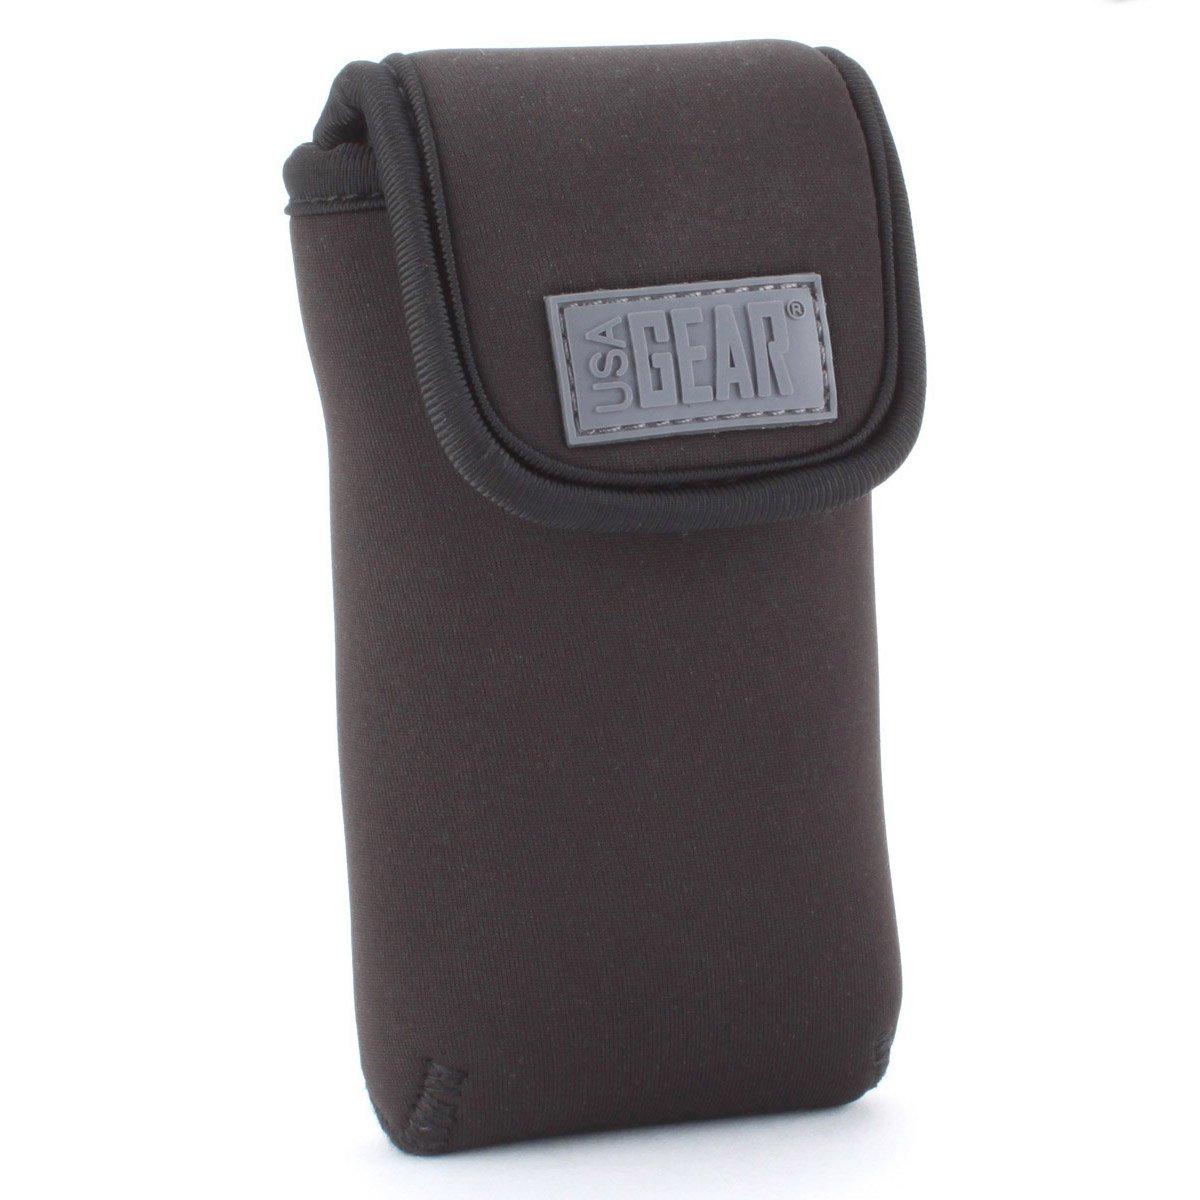 USA Gear Portable GPS Carrying Case for Garmin eTrex 10 Worldwide, 30x, Approach G8, Magellan eXplorist 350H and More Units - Built in Belt Loop, Carabiner Clip & Hook & Loop Enclosure